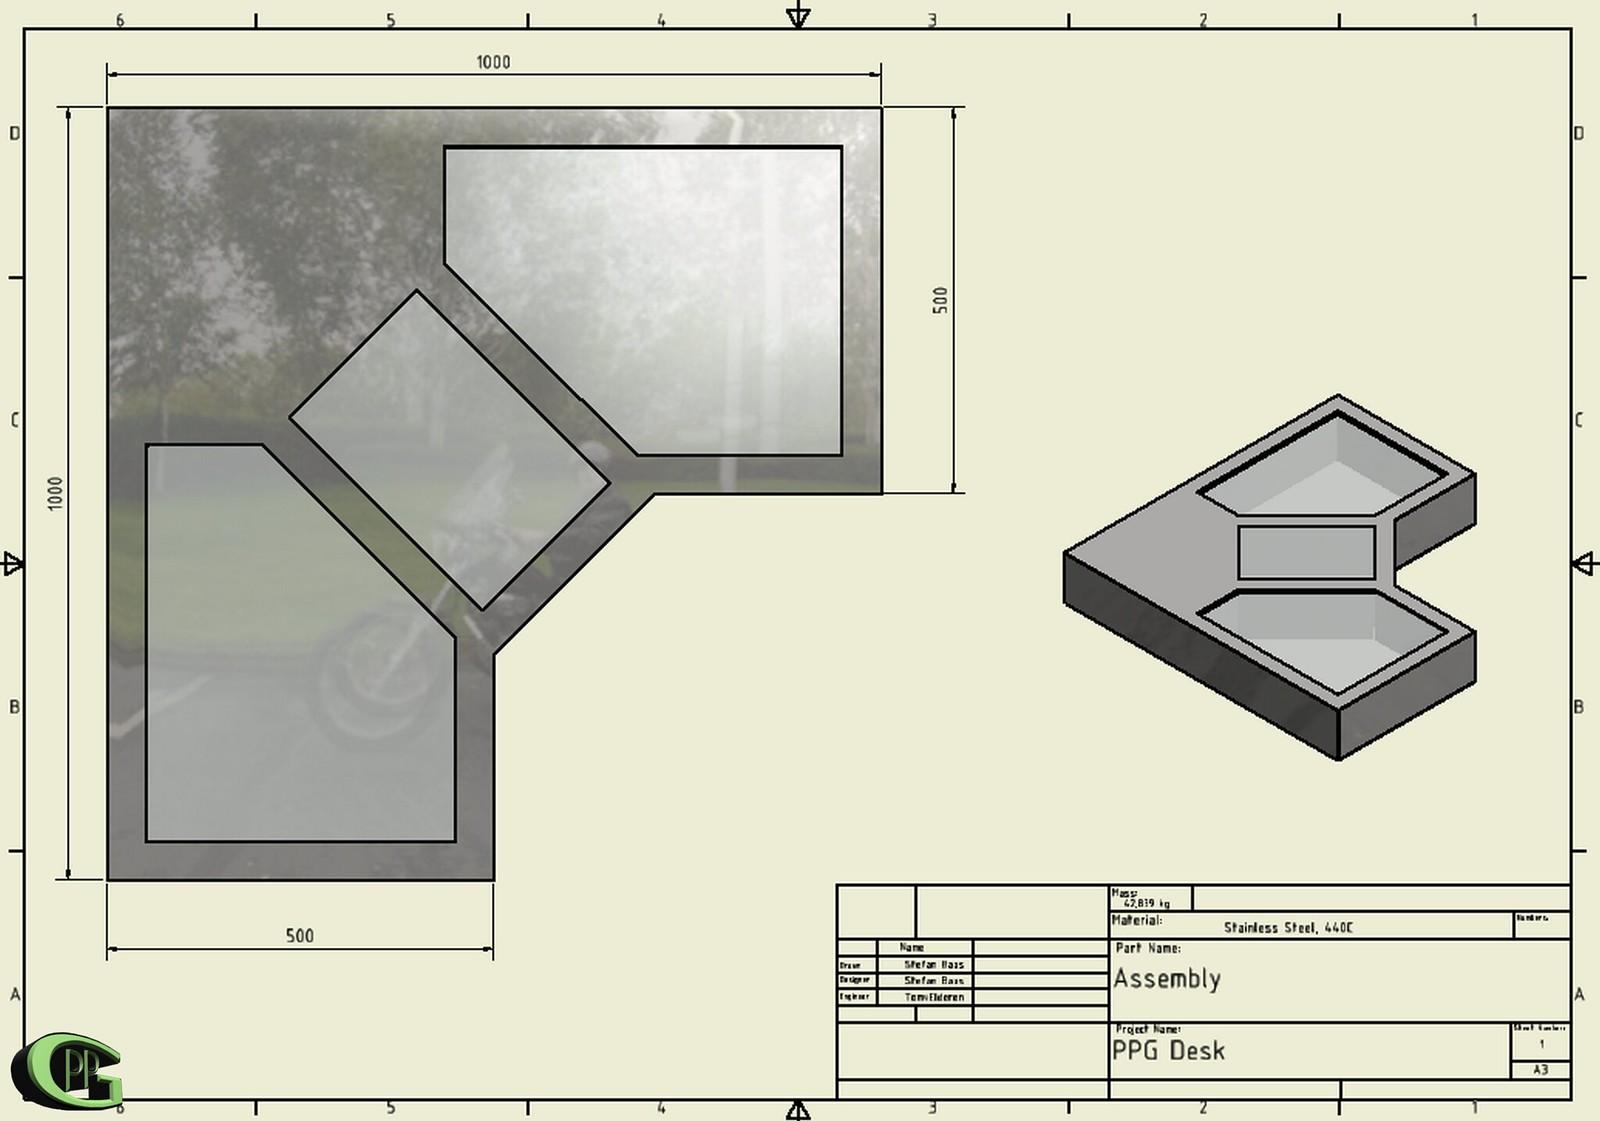 https://farm2.staticflickr.com/1526/25741428043_7b8bbccdb3_h.jpg